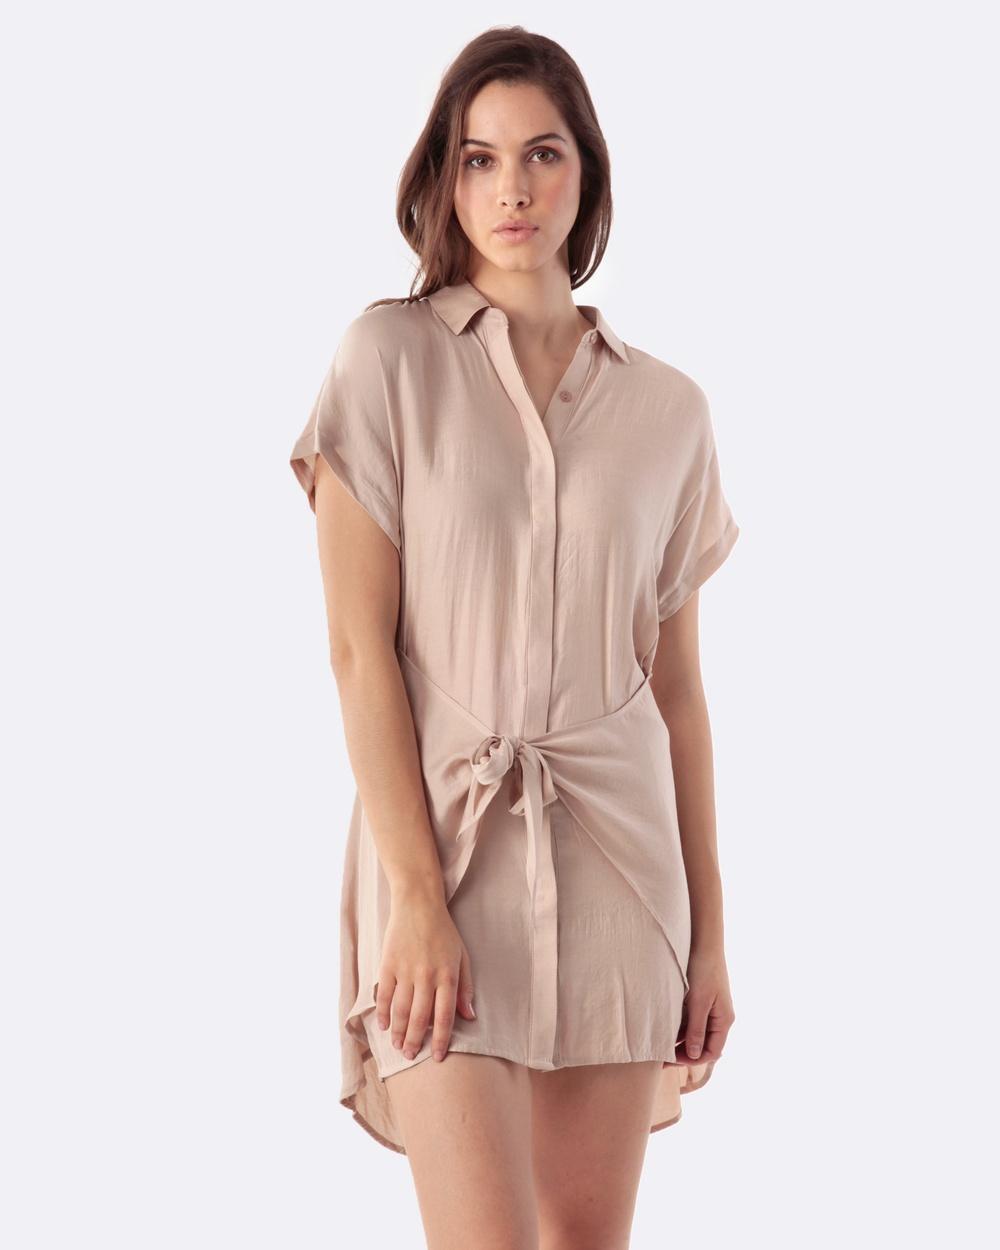 Amelius Pixie Dress Dresses Camel Pixie Dress